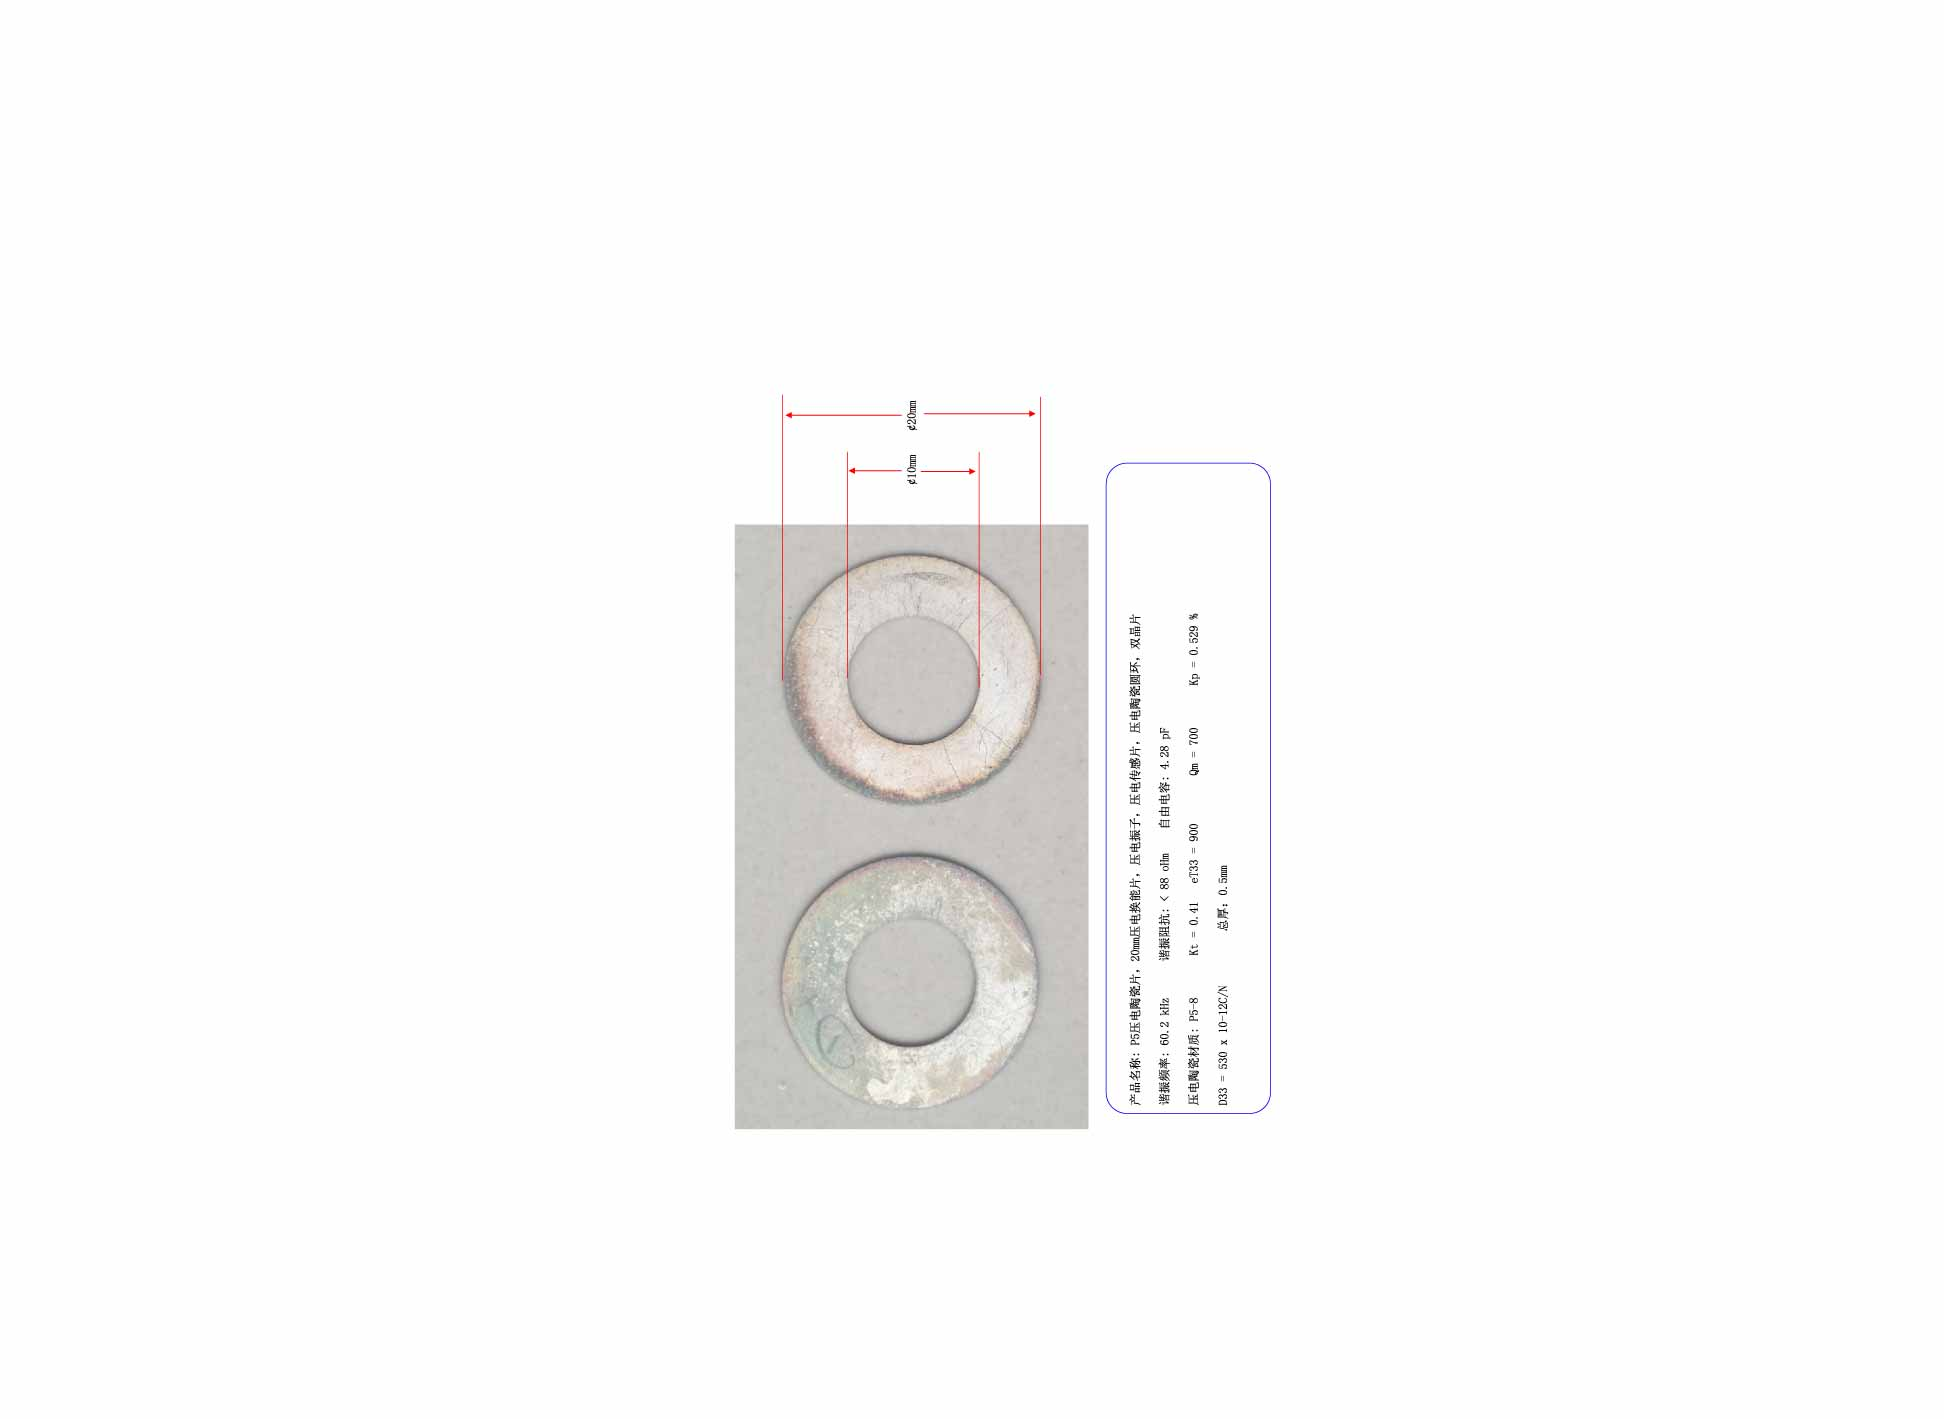 PZT piezoelectric ceramics, 20mm piezoelectric transducer, piezoelectric vibrator, piezoelectric ceramic bimorph. pzt piezoelectric ceramic atomizer medical piezoelectric ceramic piece